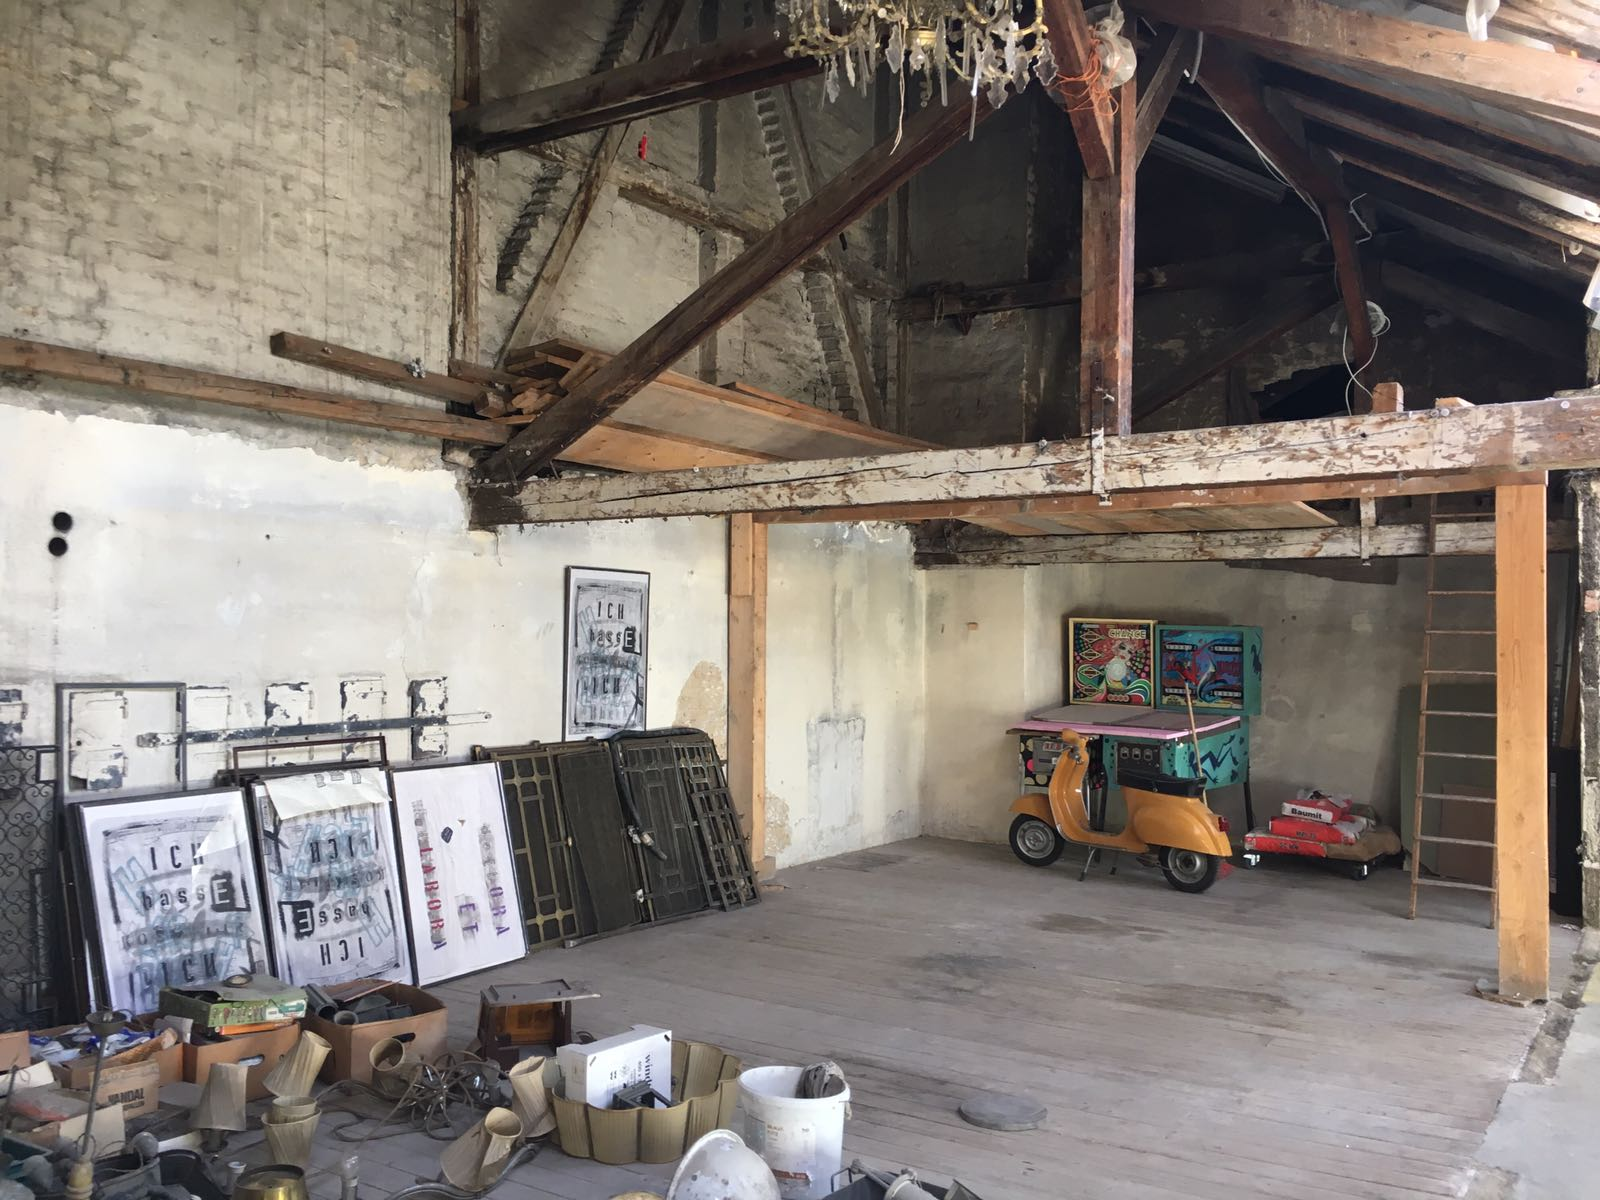 Dachboden - Filmlocation FILMQUARTIER WIEN